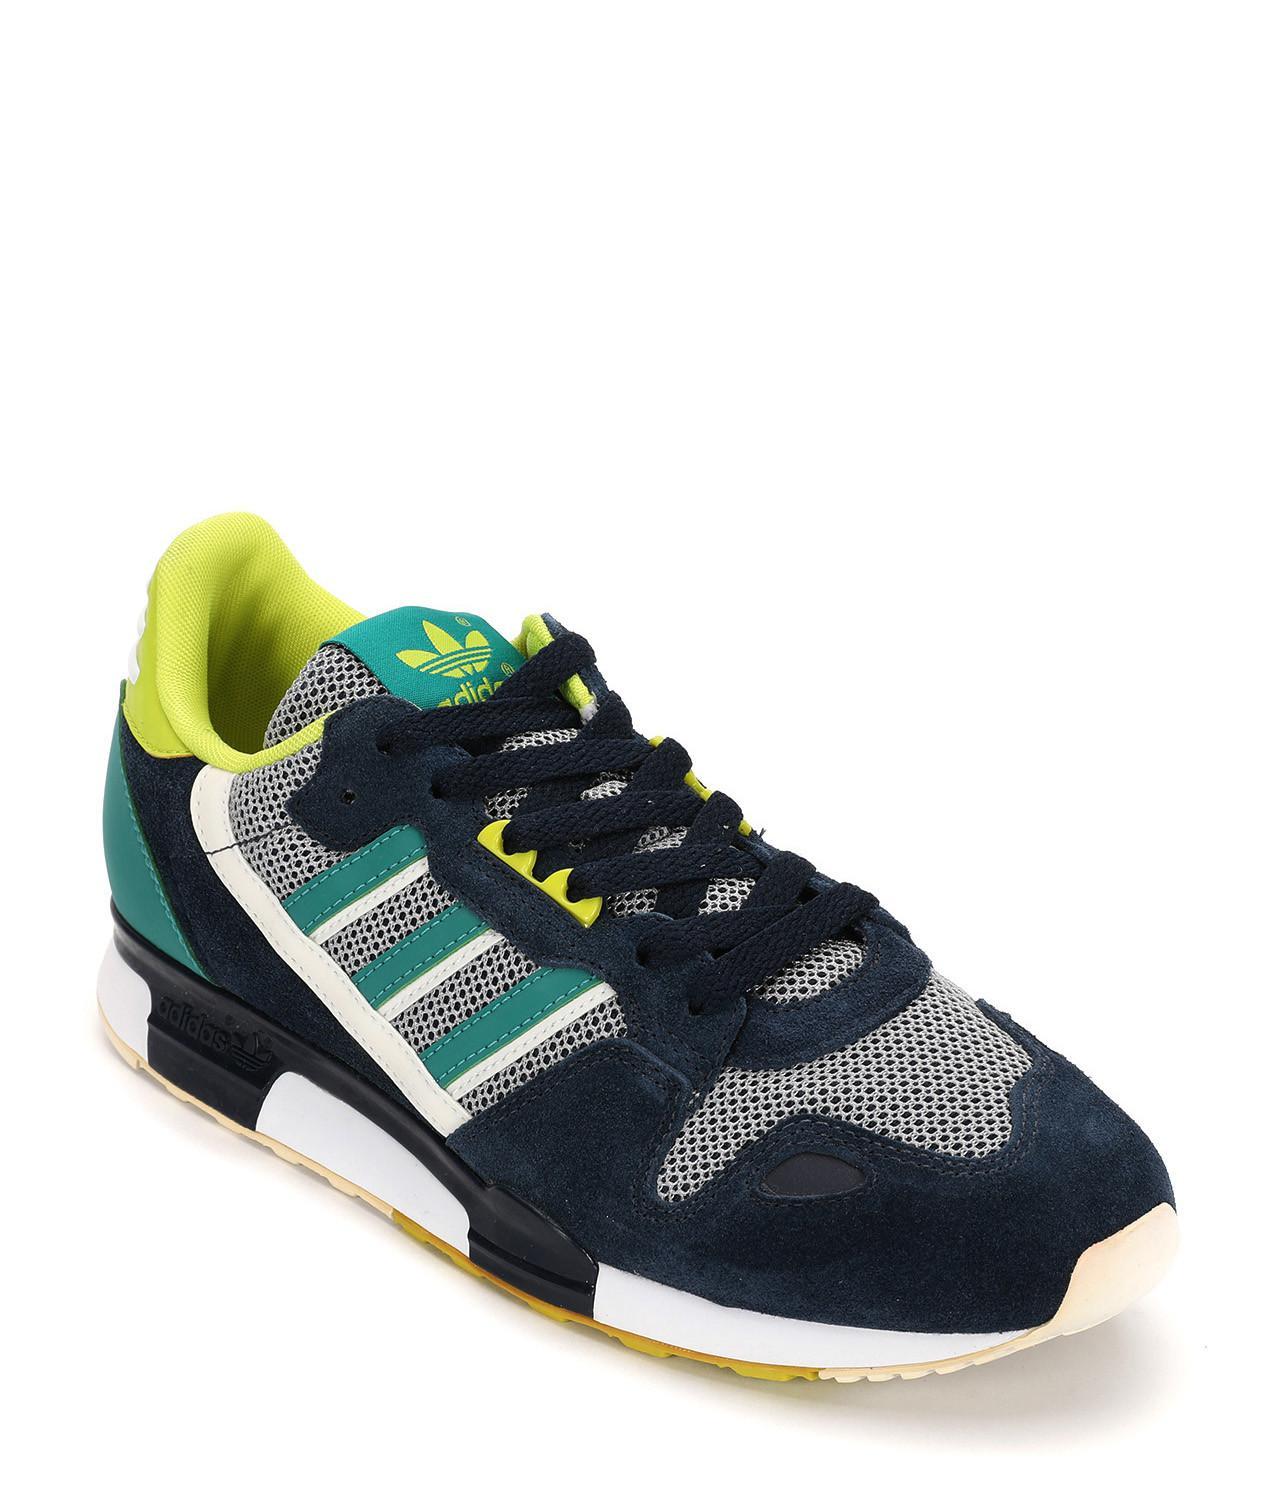 adidas Zx 700 W, 's Sneakers Green in Blue Lyst